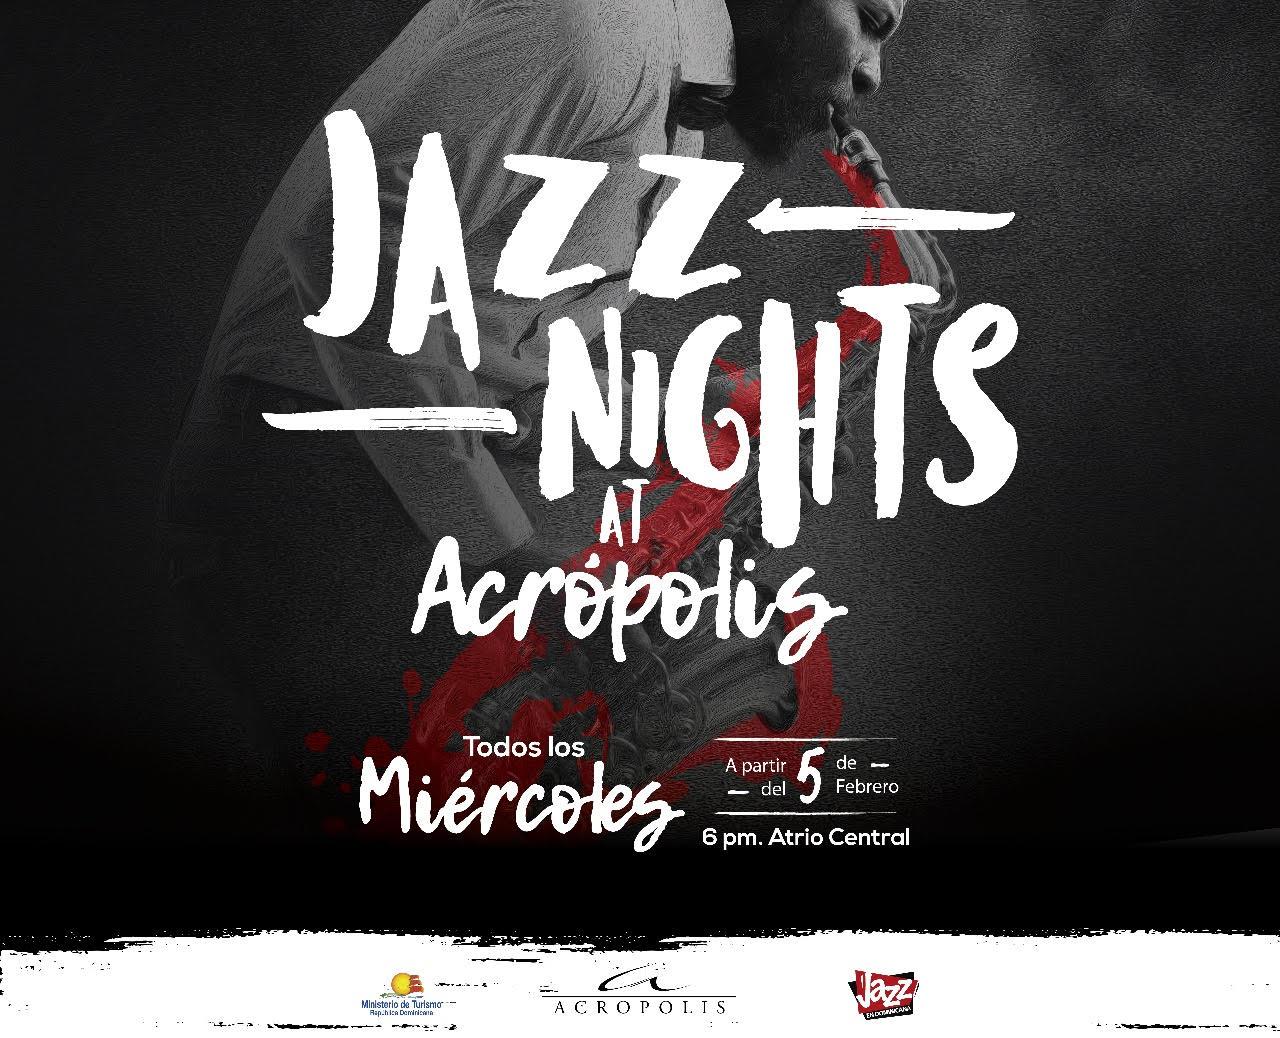 Jazz Nights at Acrópolis